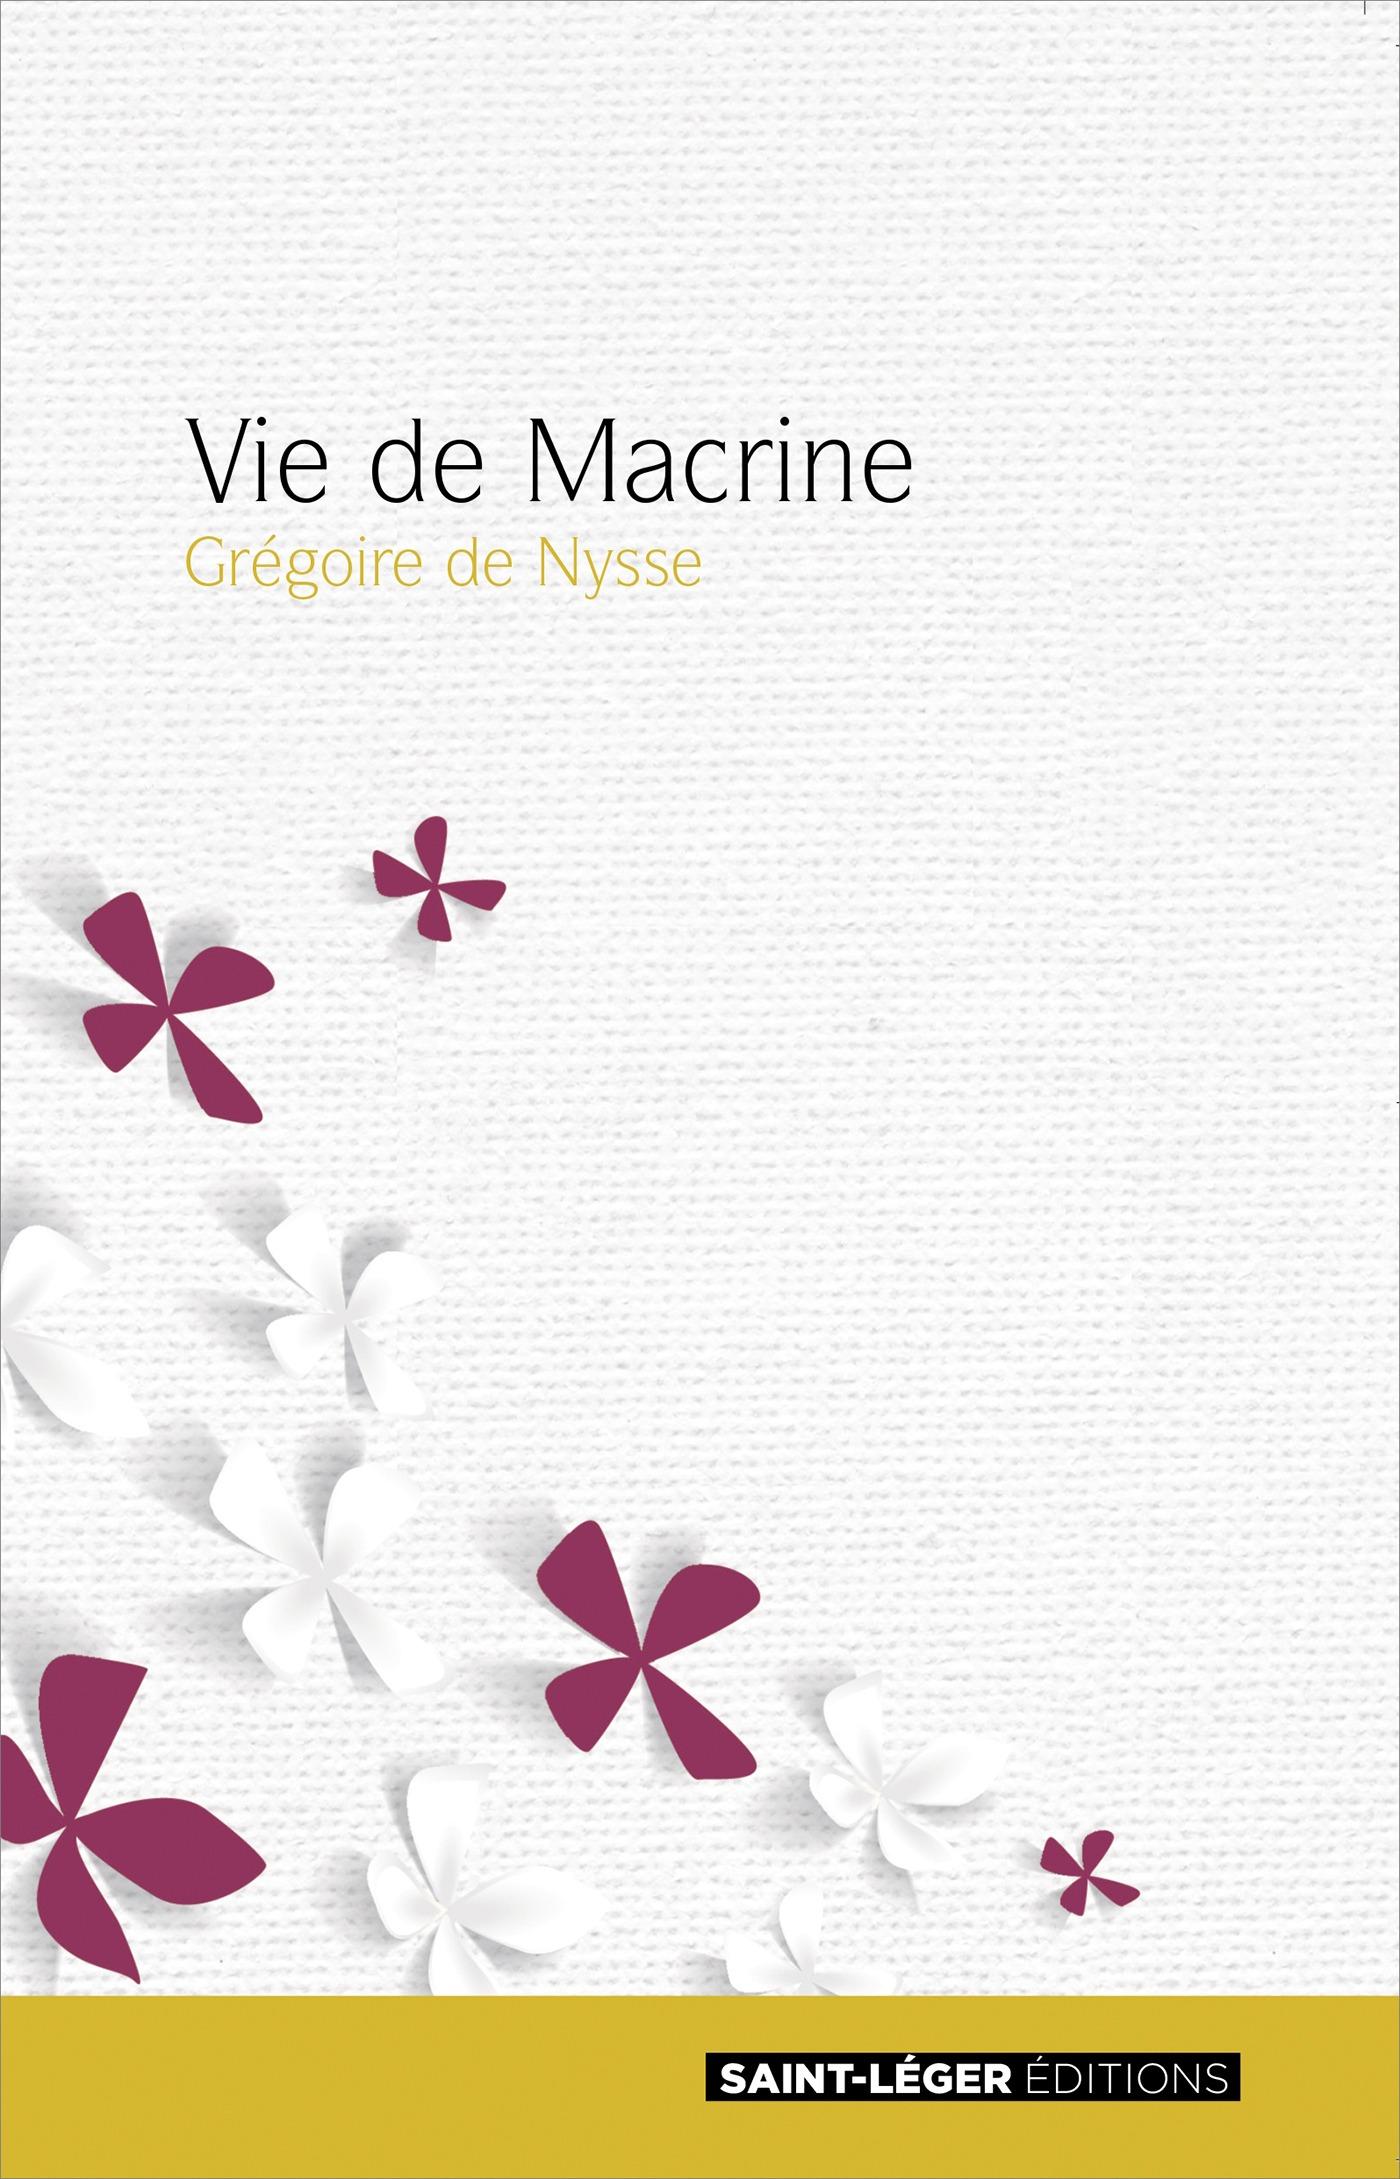 Vie de Macrine